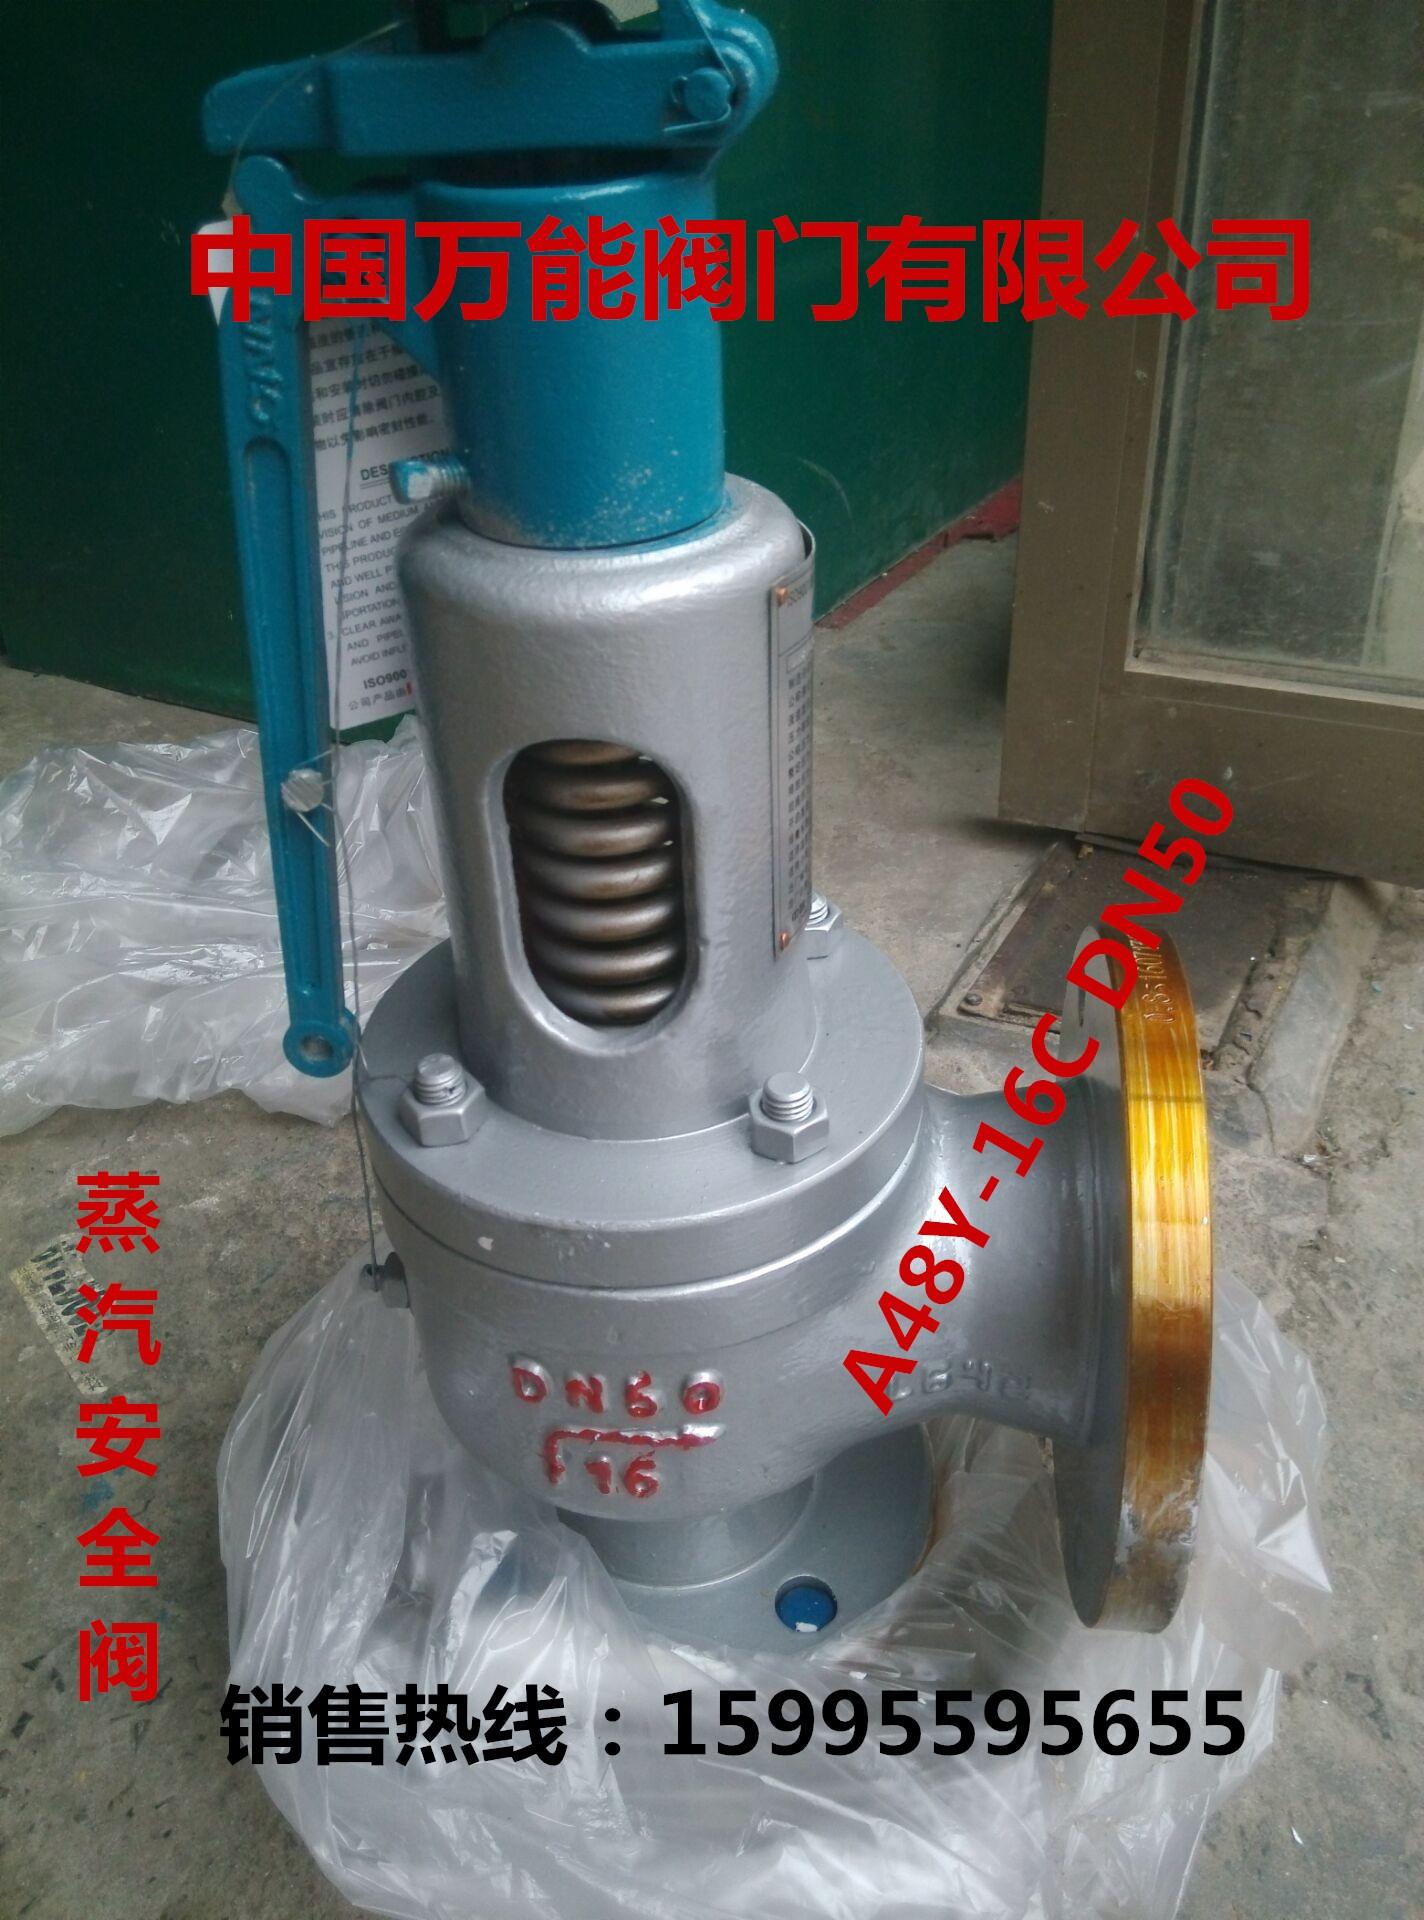 De klep in de lente van China een veiligheidsklep stoom flens veiligheidsklep A48Y-16CDN200